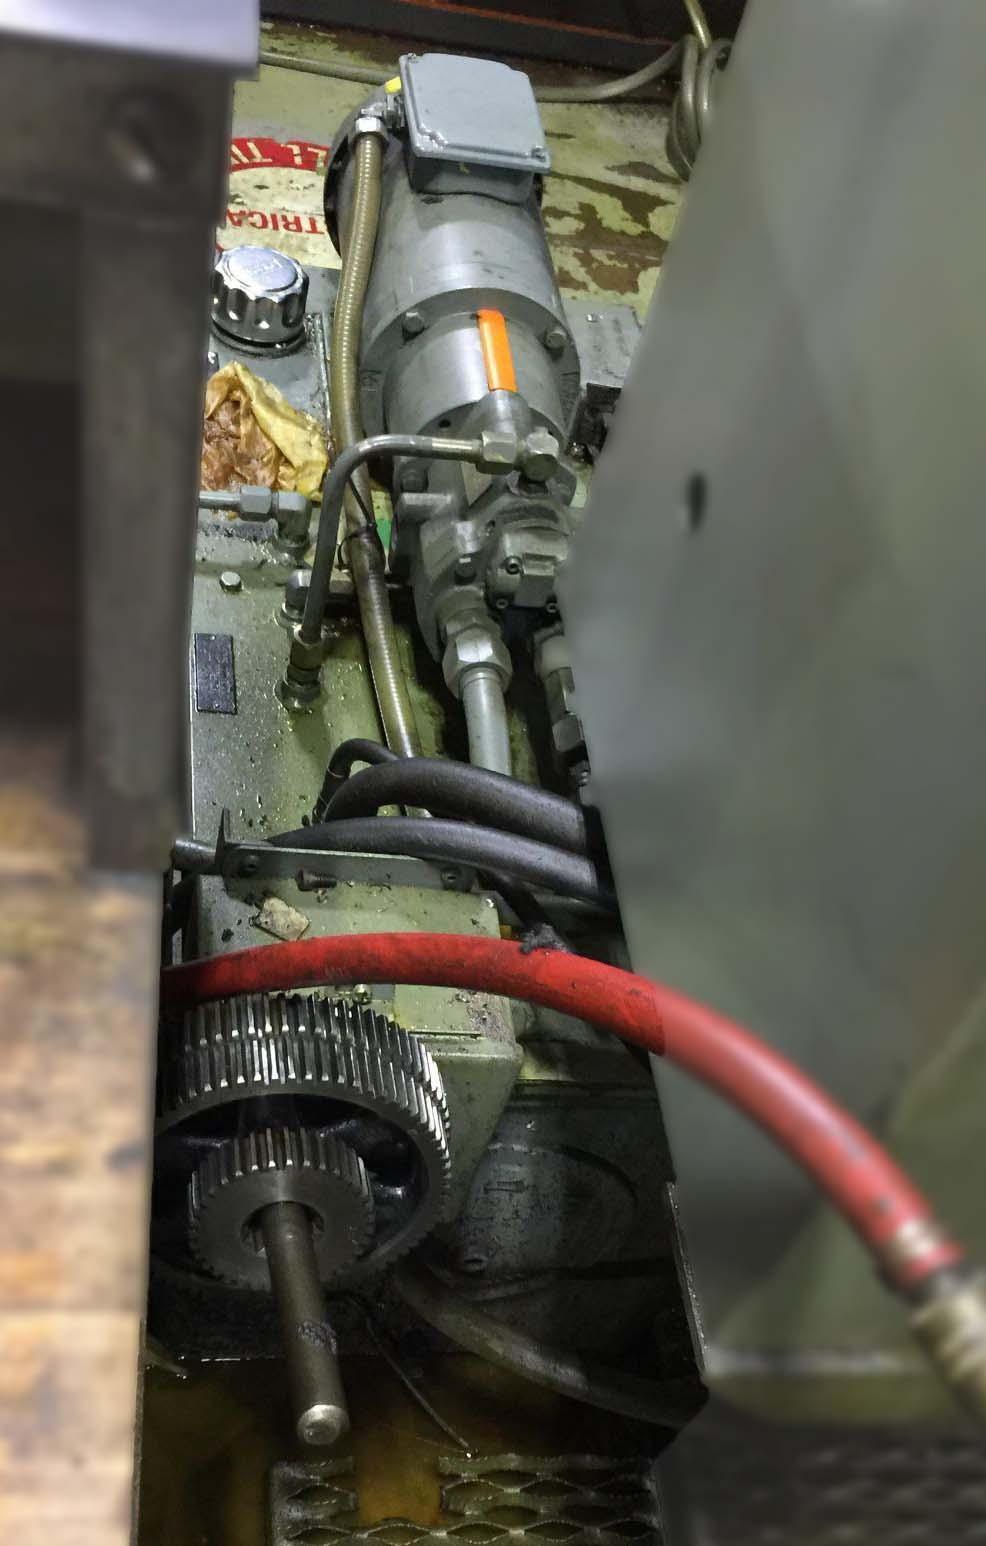 "14-15 BOURN & KOCH/BARBER COLMAN HEAVY DUTY HORIZONTAL GEAR HOBBER, 14"" Max Work Diameter, 15"" Max Hob Slide Travel, 6.25"" Max Hob Diameter, Auto Hob Shift, Auto 2-Cut Cycle, Dwell Timer for Blind Cuts, Hydraulic Workhead, Hydraulic & Coolant System, Rebuilt 1998."